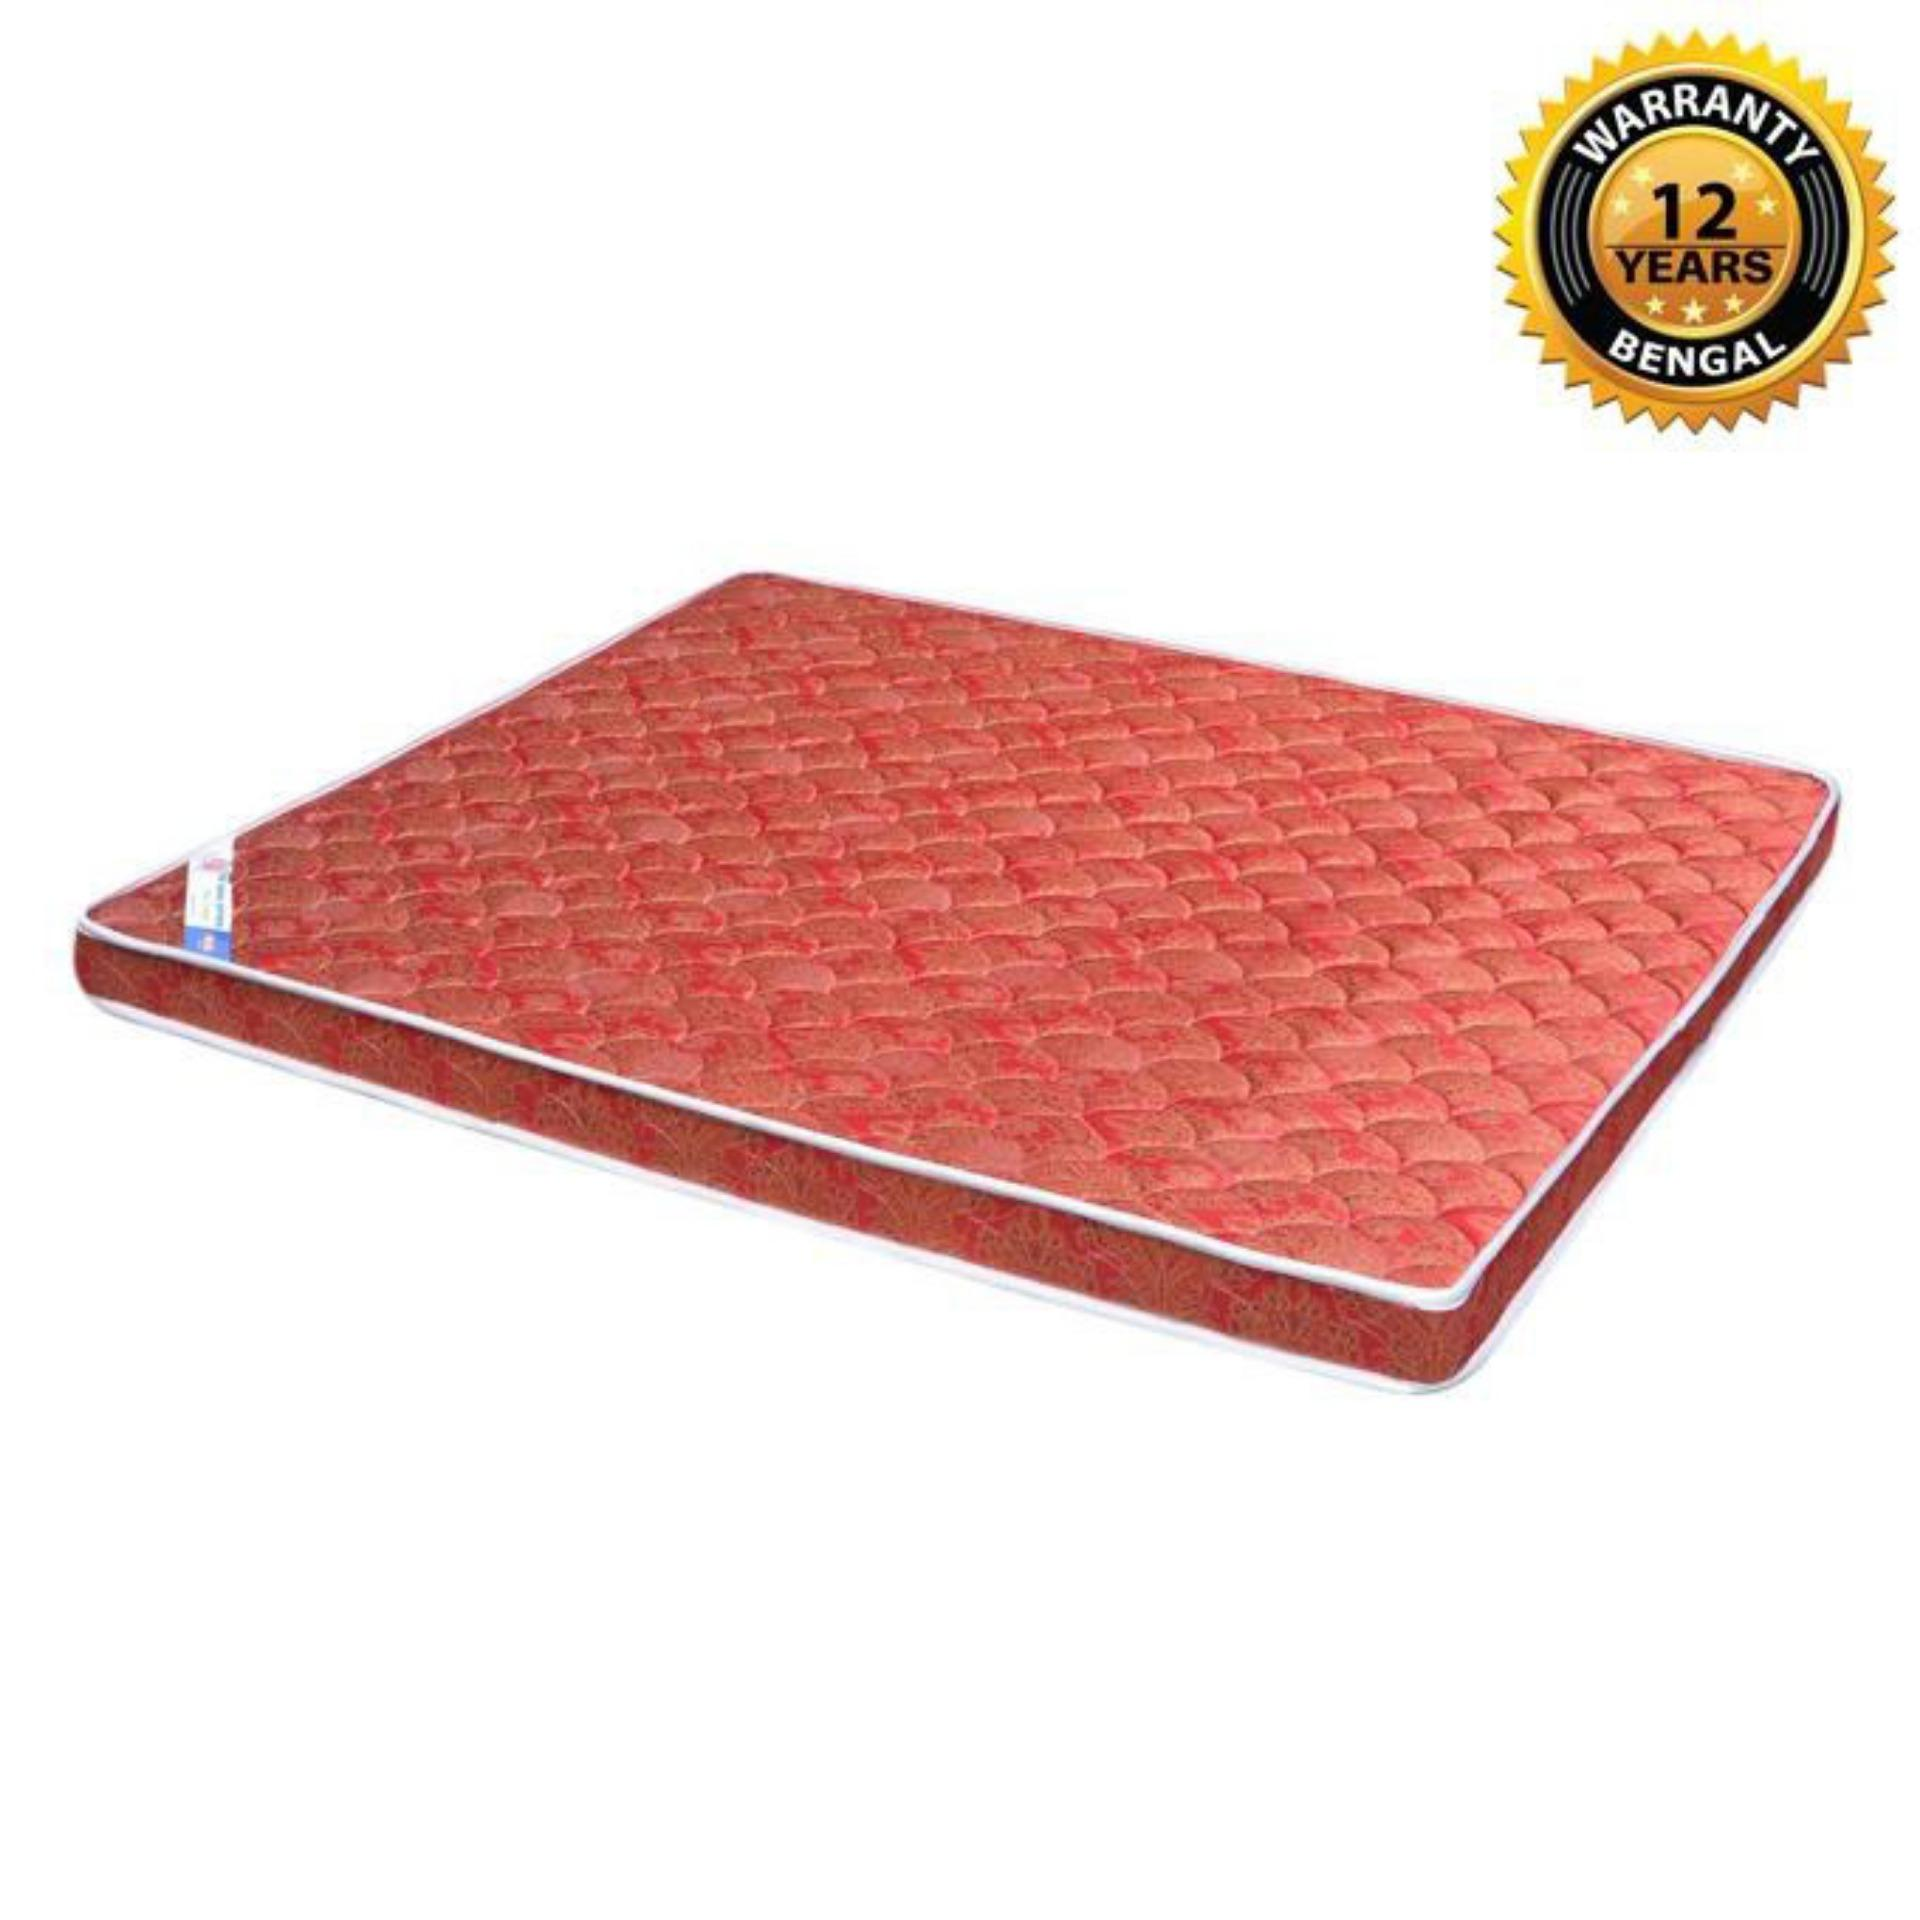 "Bengal Spring Mattress (78""x48""x10"") - Red"